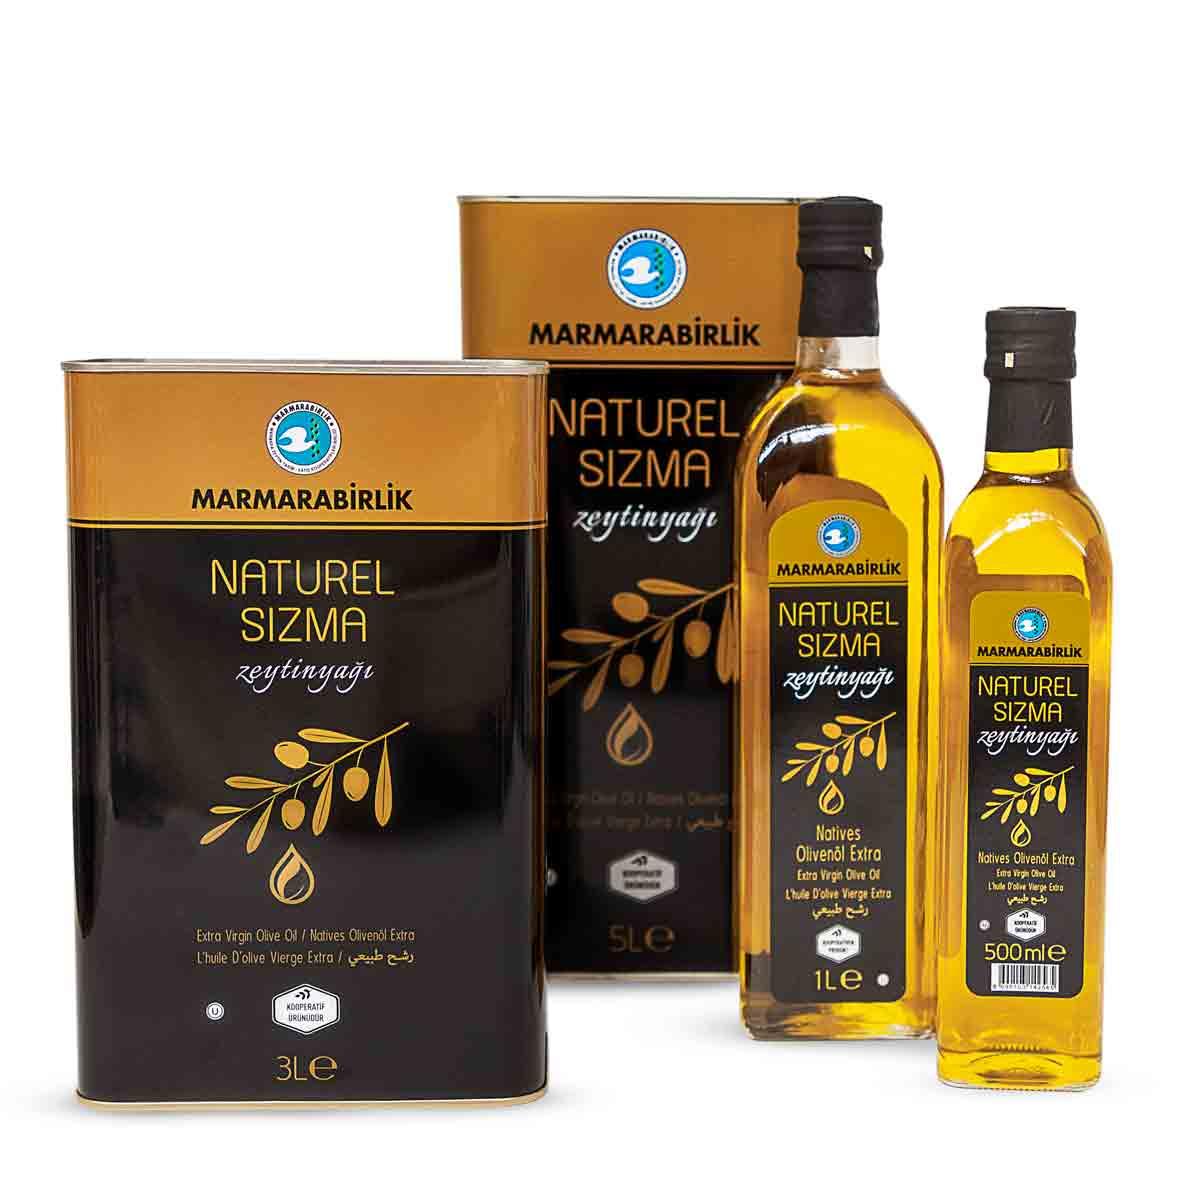 marmarabirlik olivenoel naturel sizma allegroessen front